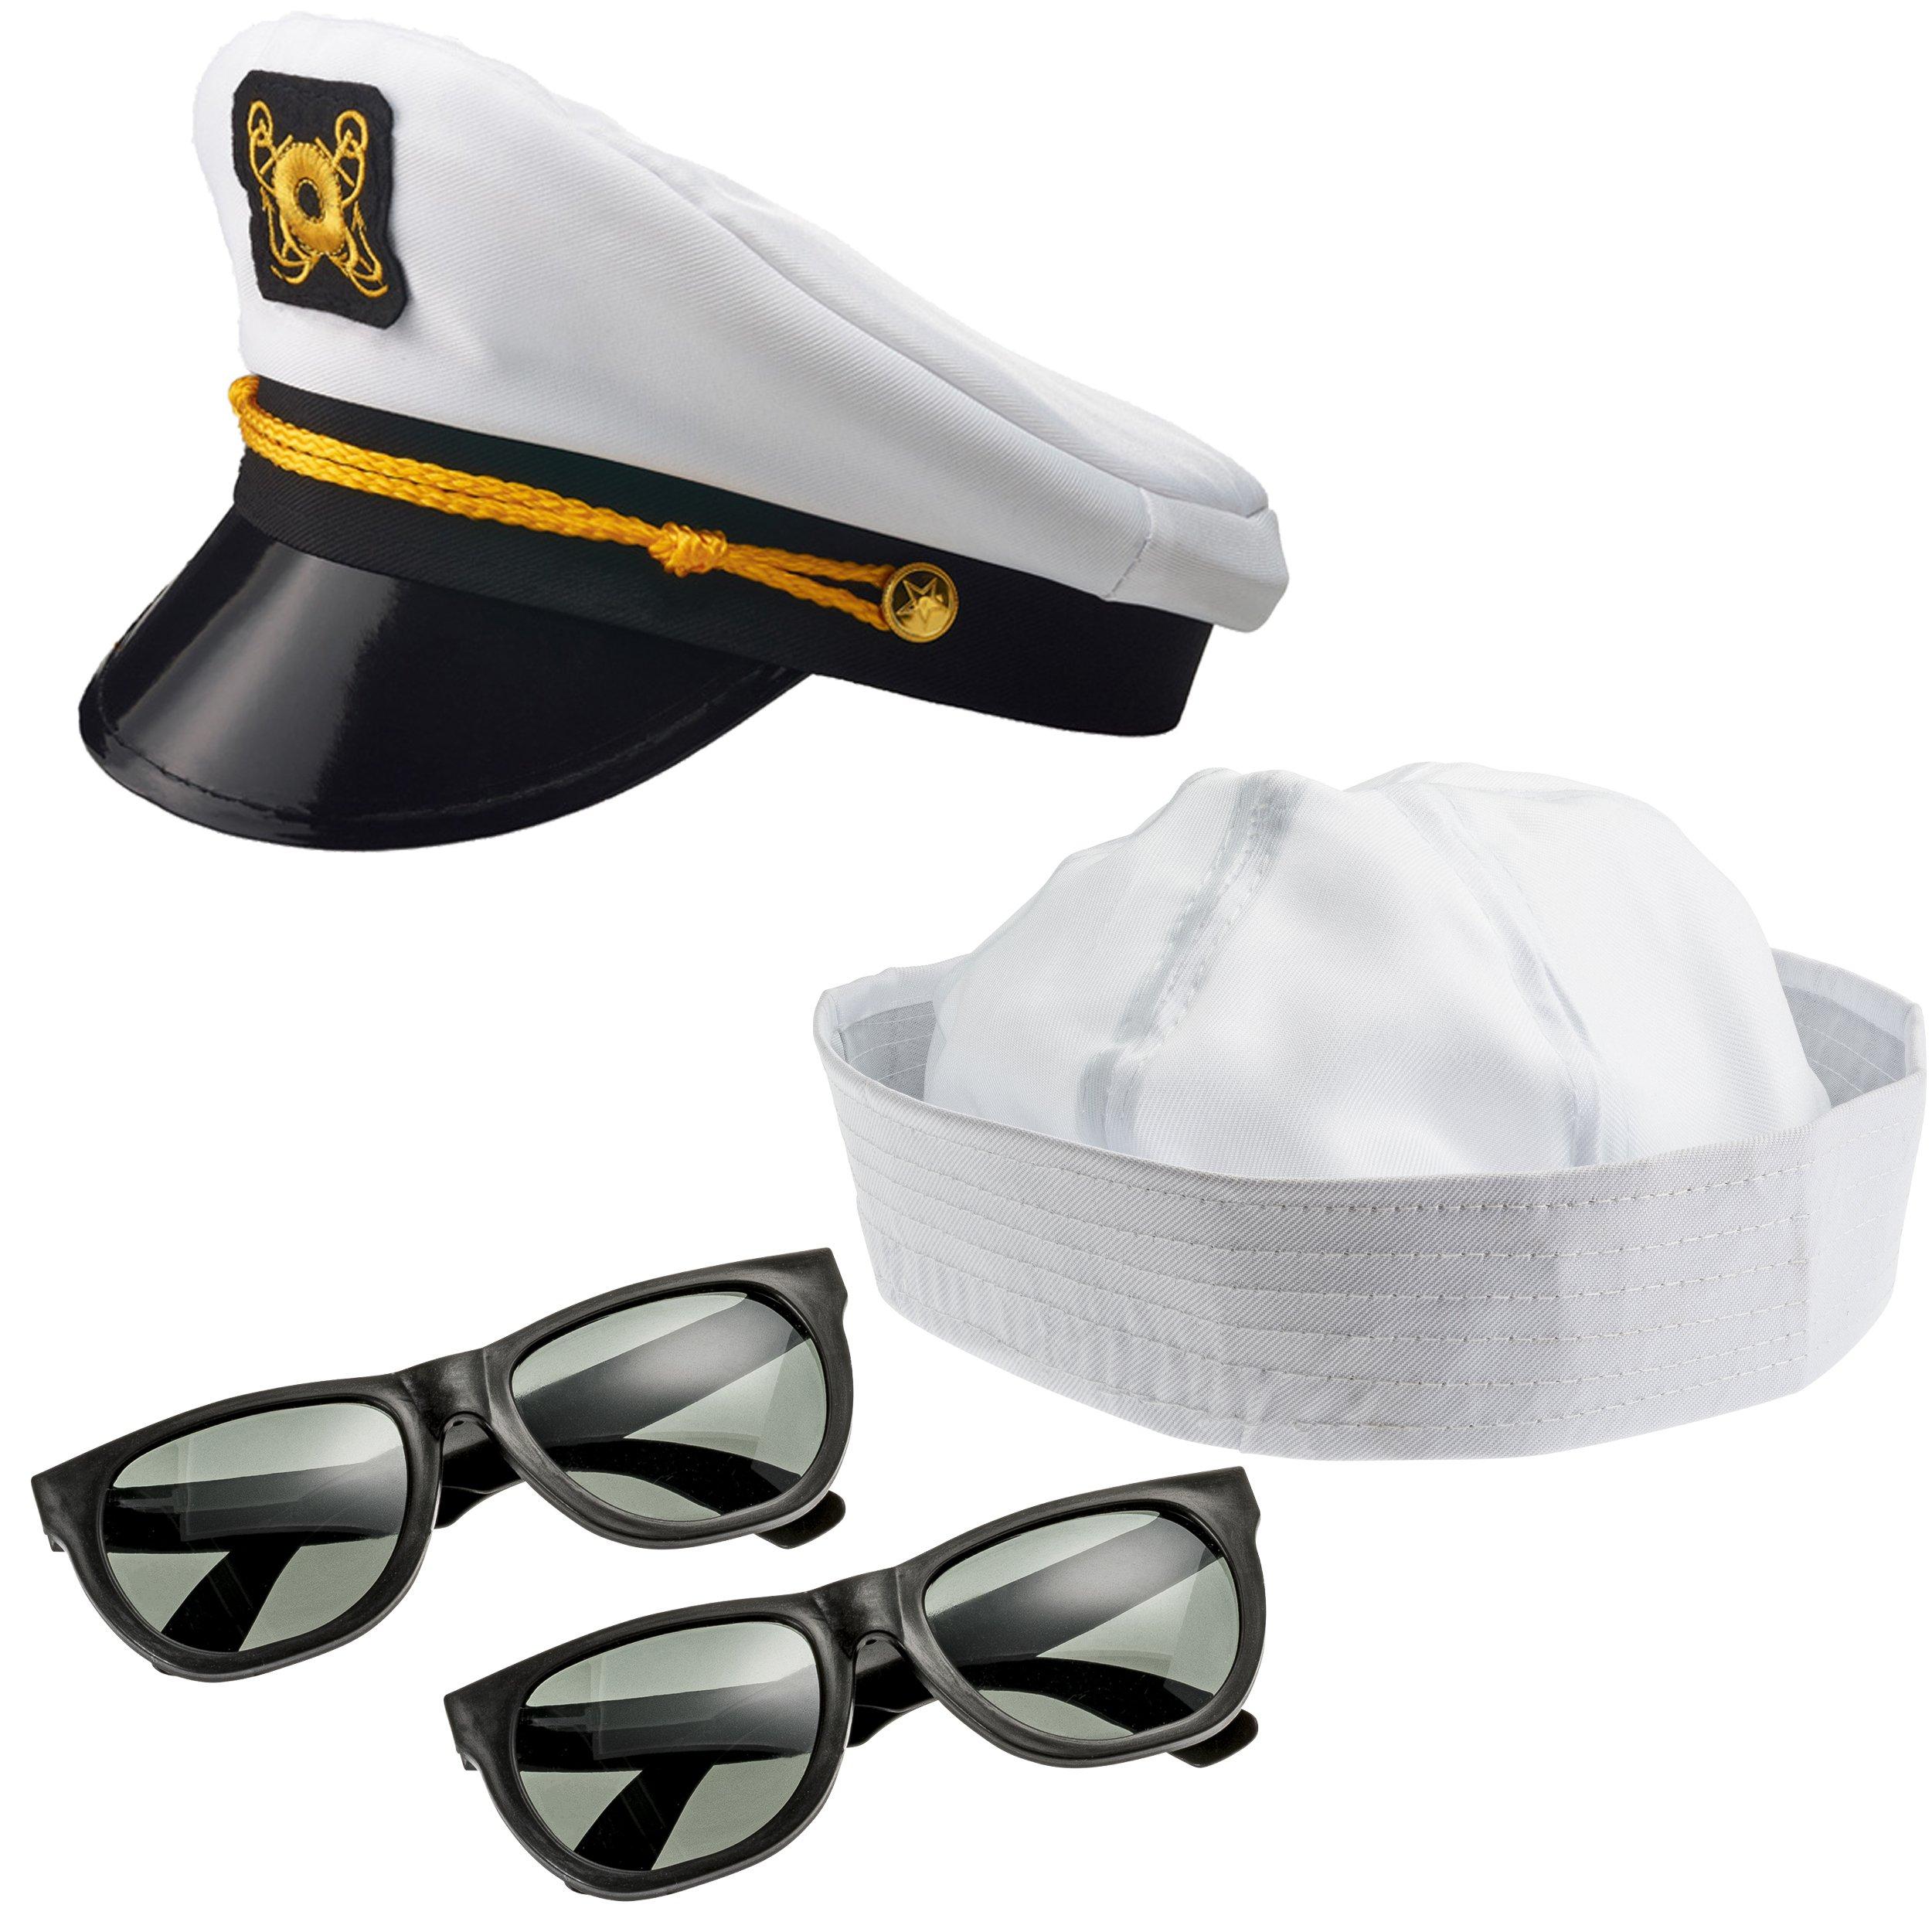 NJ Novelty Sailor Hat, Yacht Captain Hat and Sun Glasses 4 Piece Set, Adult Costume Accessories Dress up Party Hats